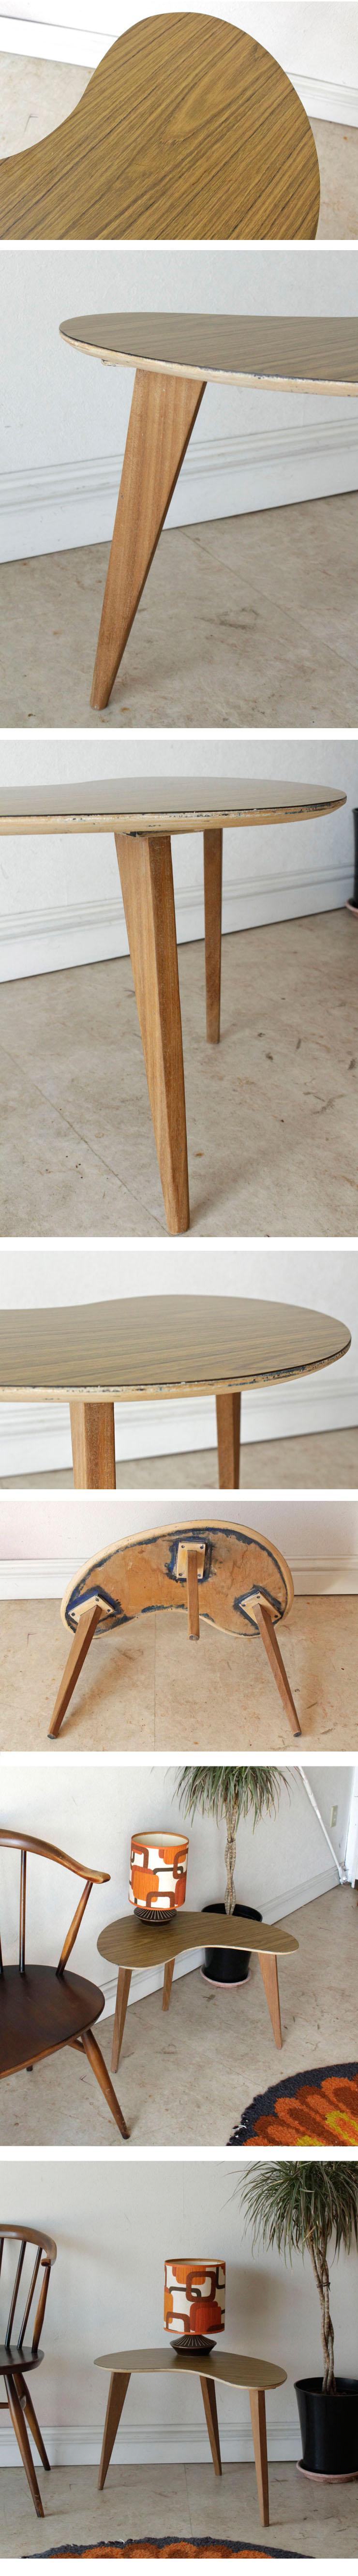 Kidneyキドニー・イギリス・サイドテーブル・コーヒーテーブル・ビンテージ・アンティーク